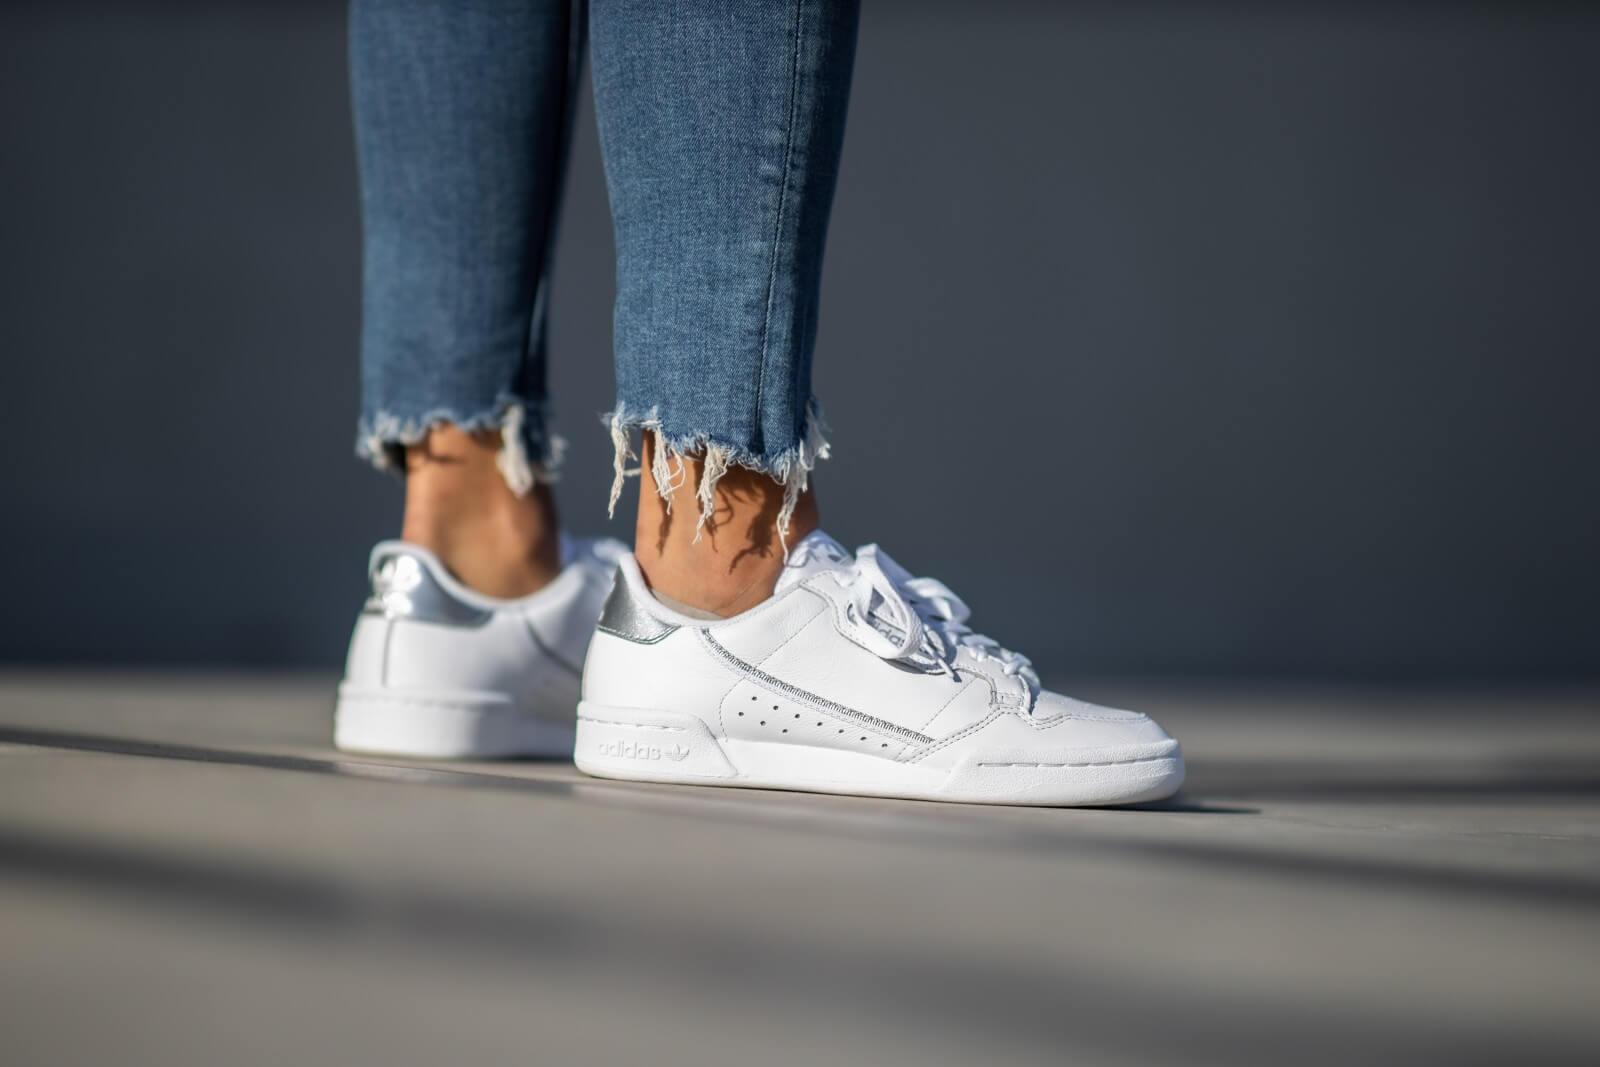 Adidas Women's Continental 80 Footwear WhiteSilver Metallic